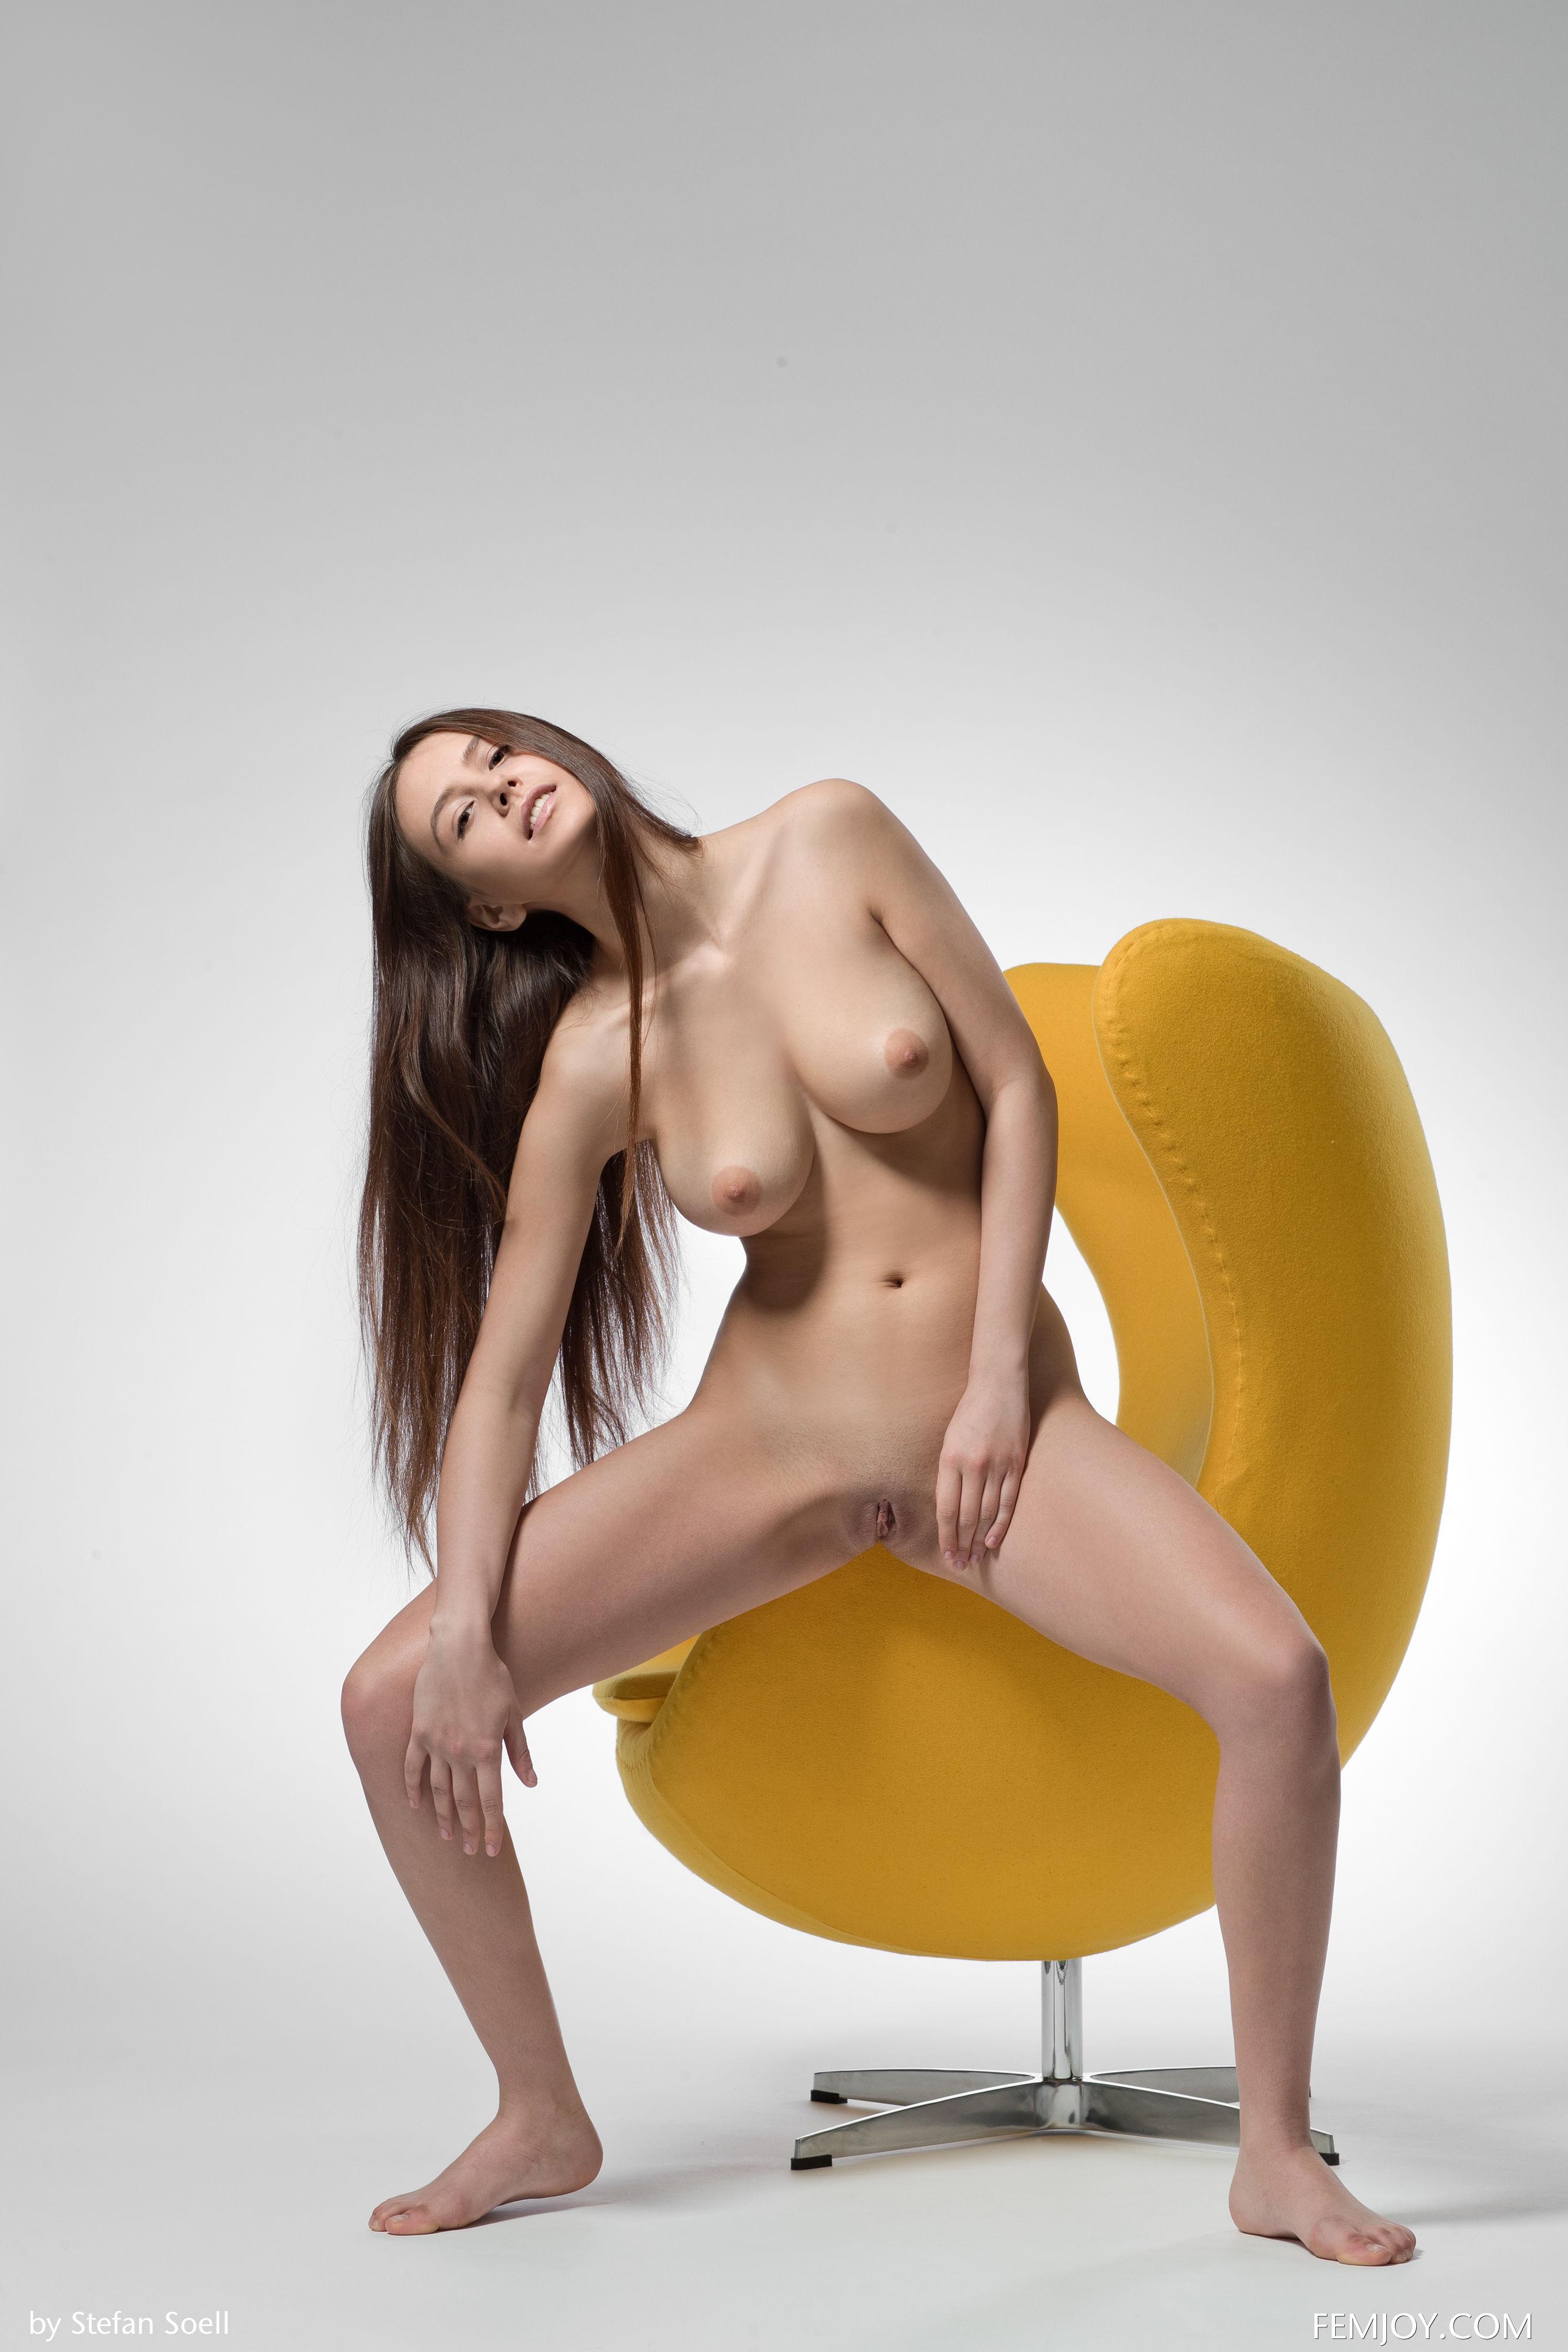 76857671_alisai_femjoy_stefansoell_yellow_19052018p_21.jpg